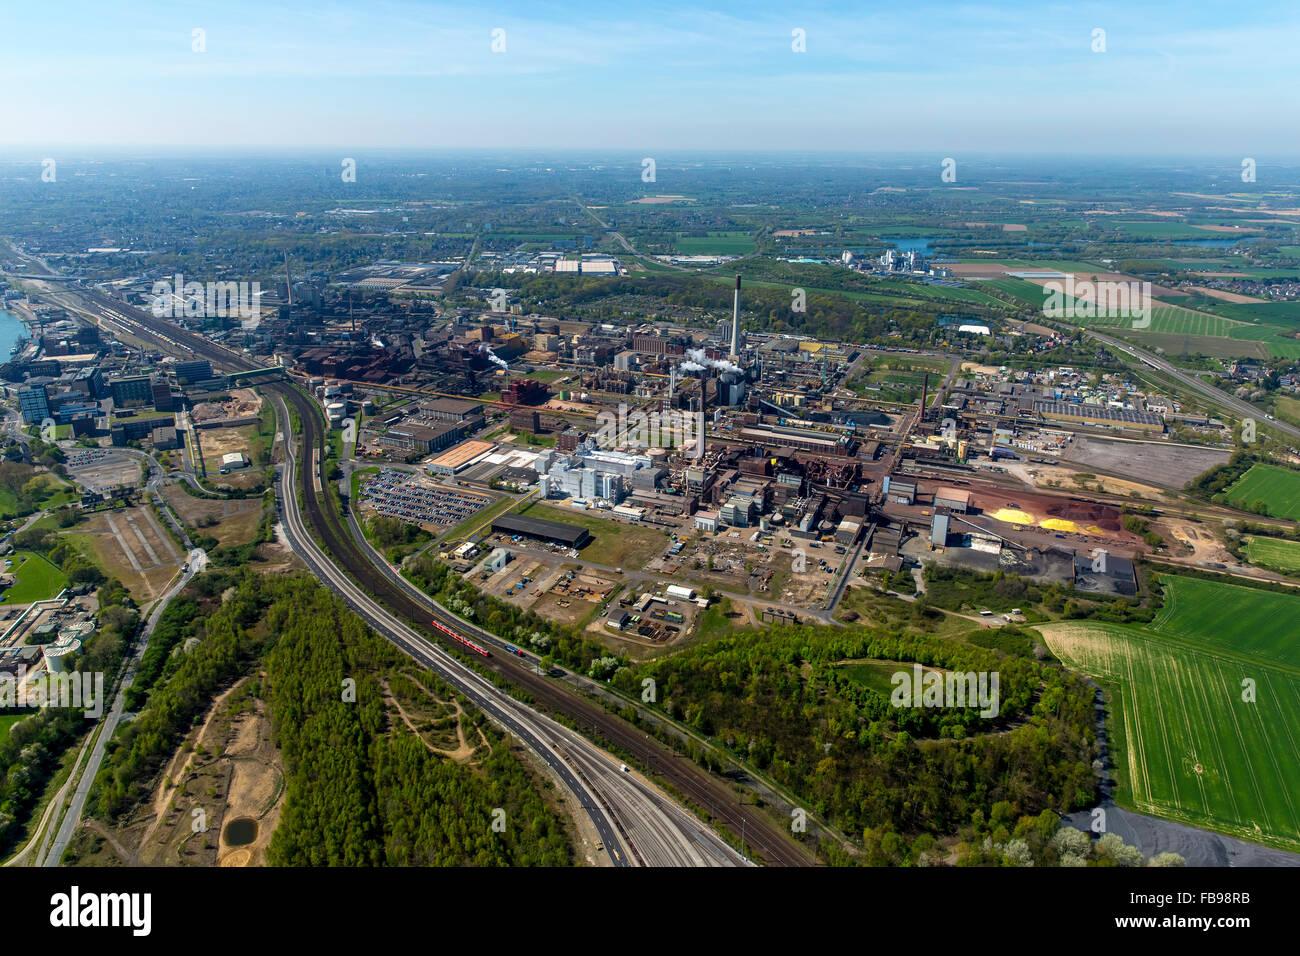 Aerial view, Krefeld Bayer Uerdingen, Duisburg, Ruhr area, Duisburg-North, North Rhine Westphalia, Germany, Europe, - Stock Image